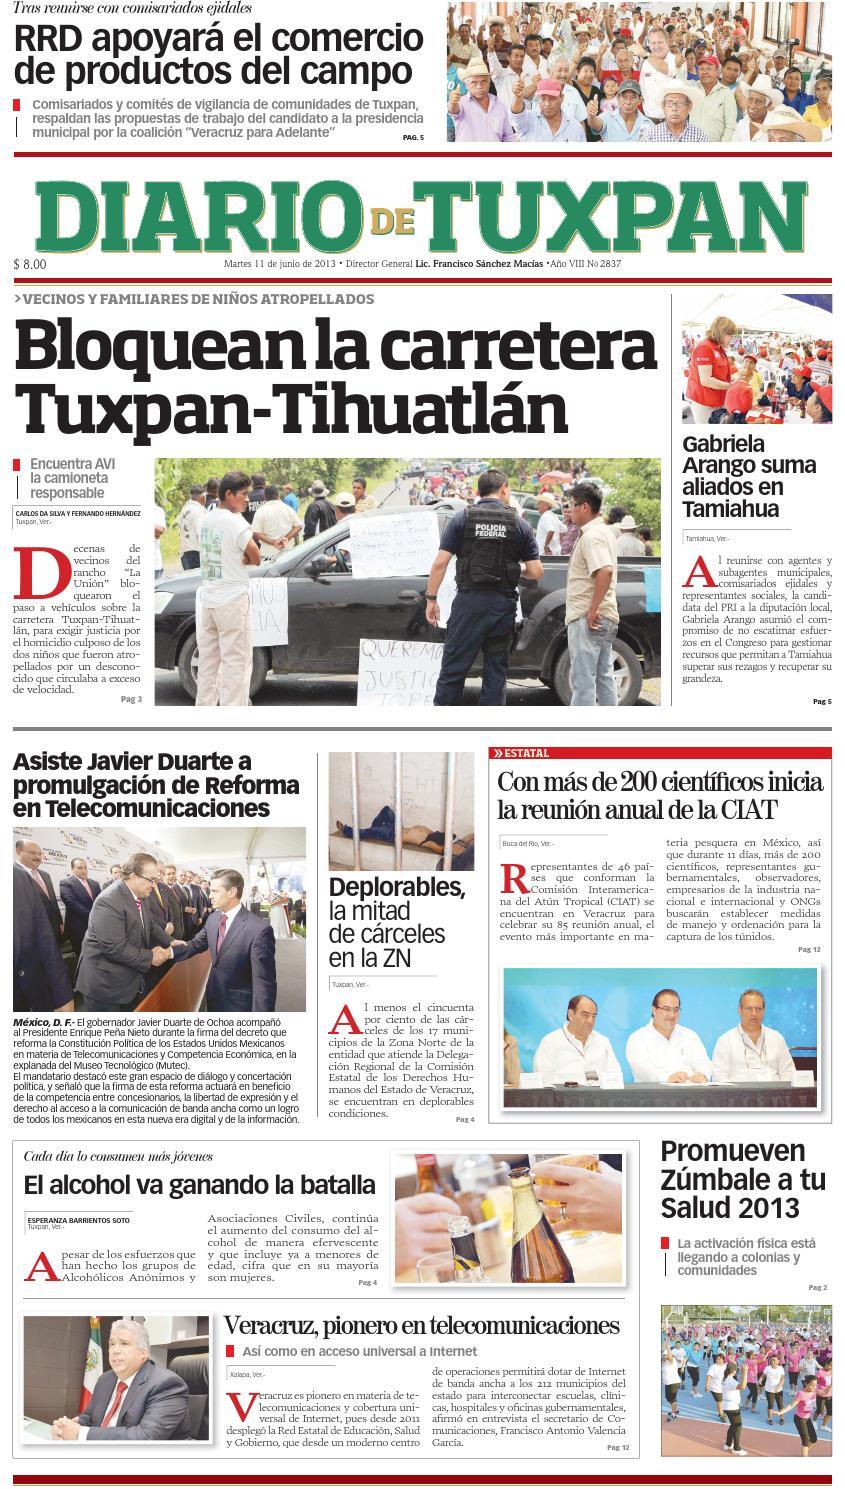 Diario De Tuxpan 11junio2013 By Diario De Tuxpan Issuu